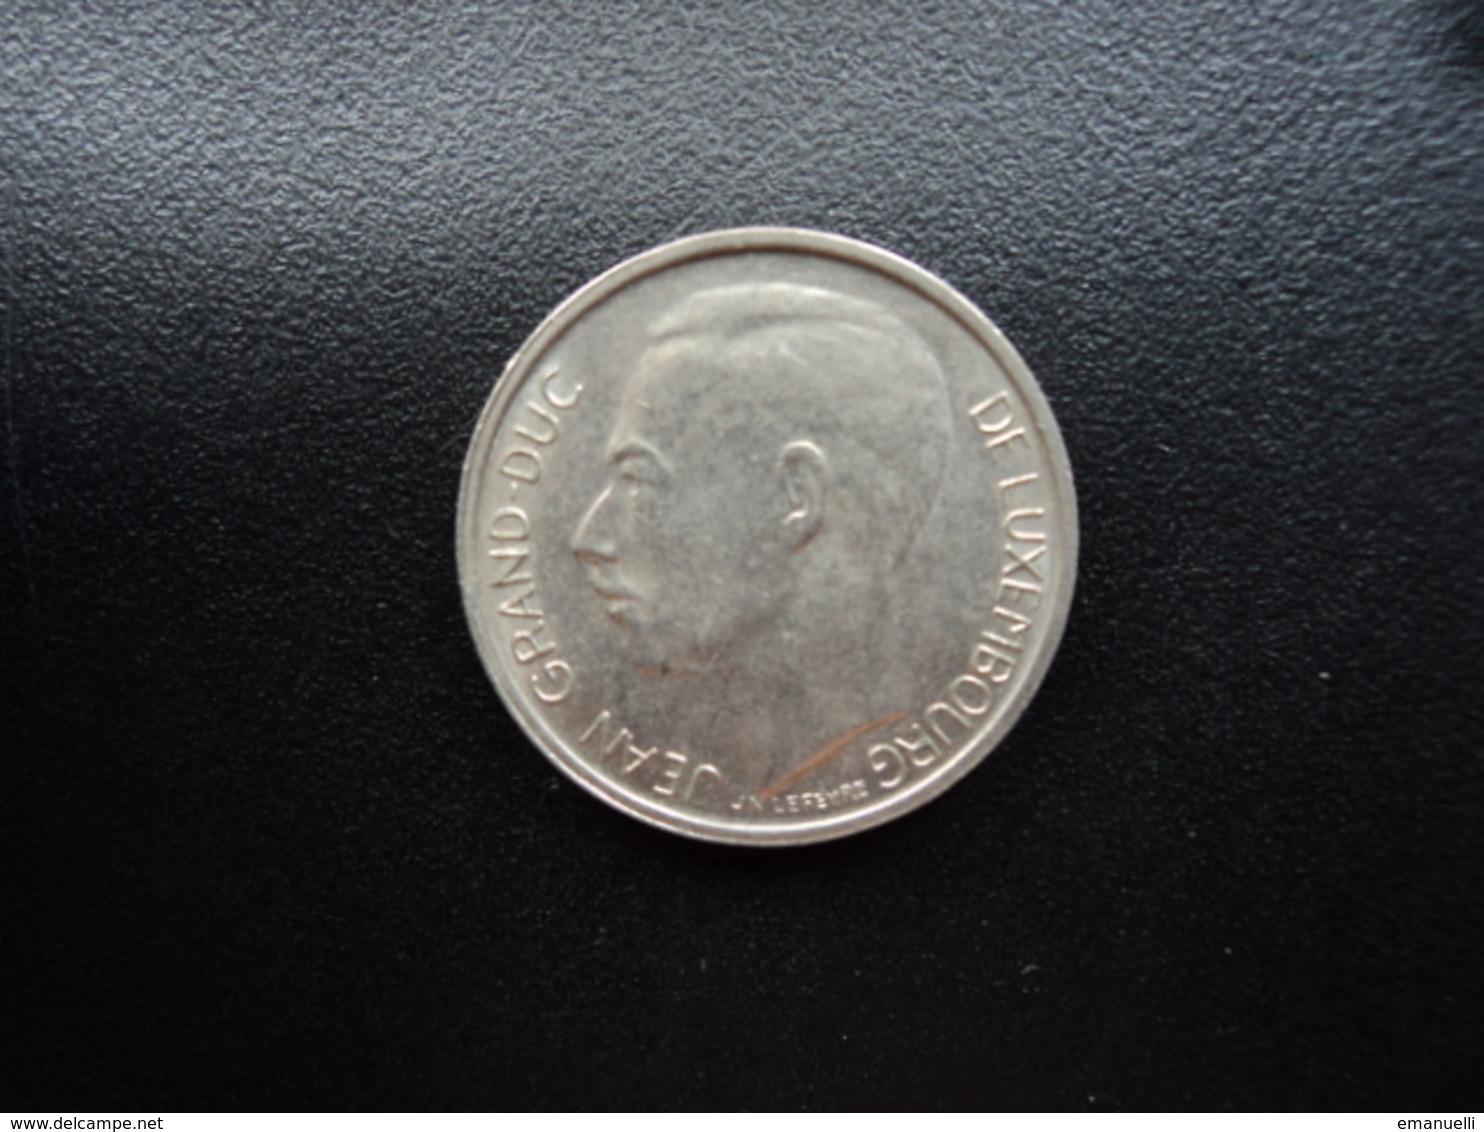 LUXEMBOURG : 1 FRANC  1970   KM 55    SUP - Luxemburgo